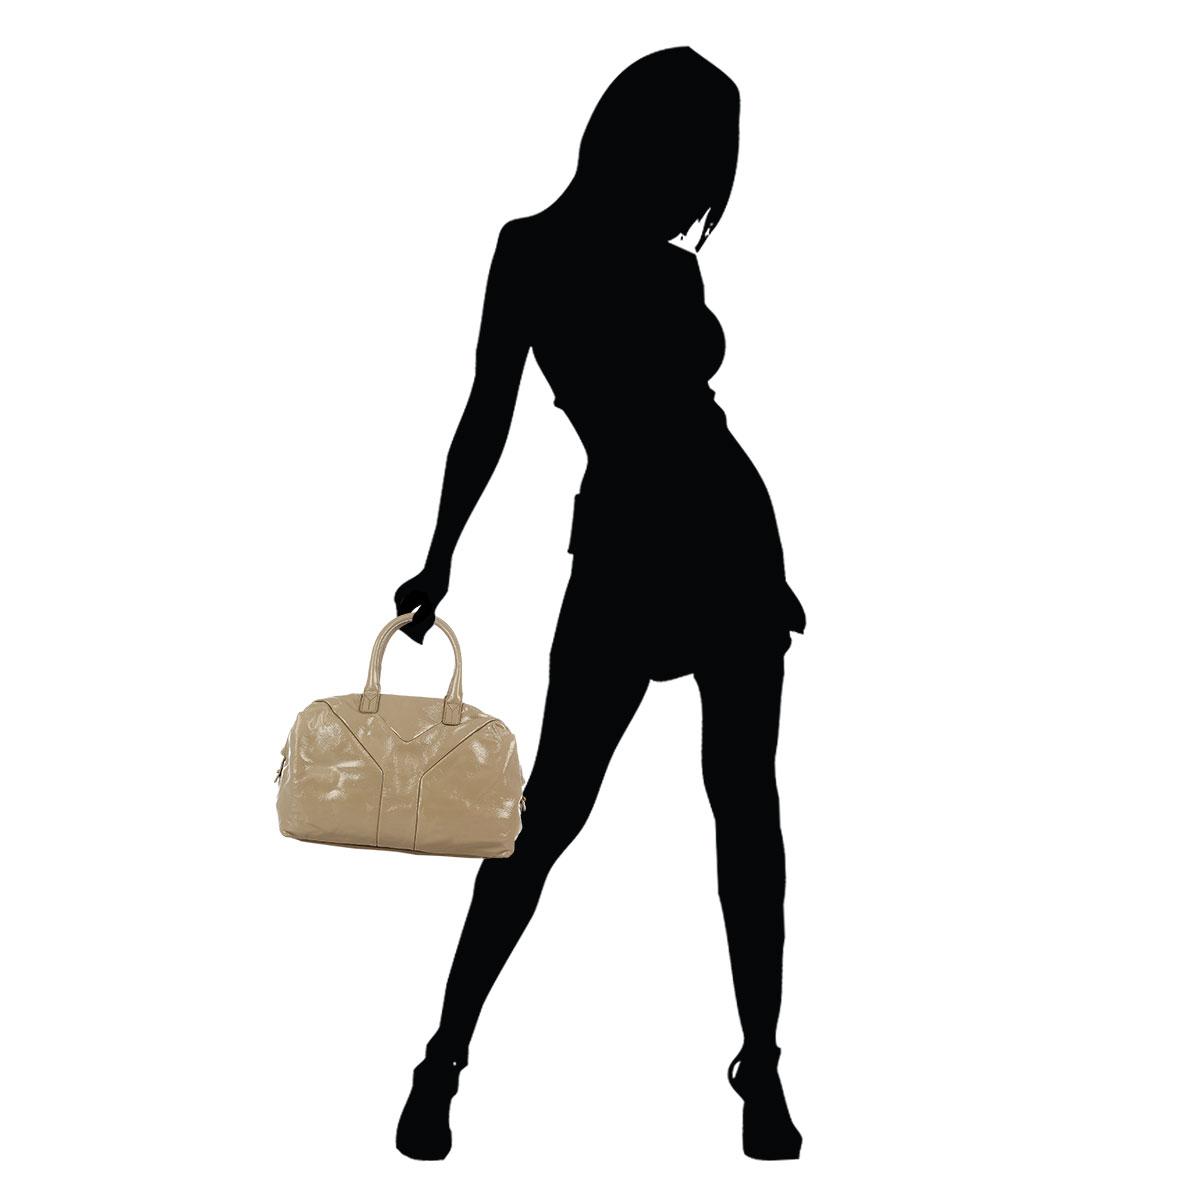 huge handbags - Yves Saint Laurent Women Brushed Leather SAC EASY Bag - Spence Outlet